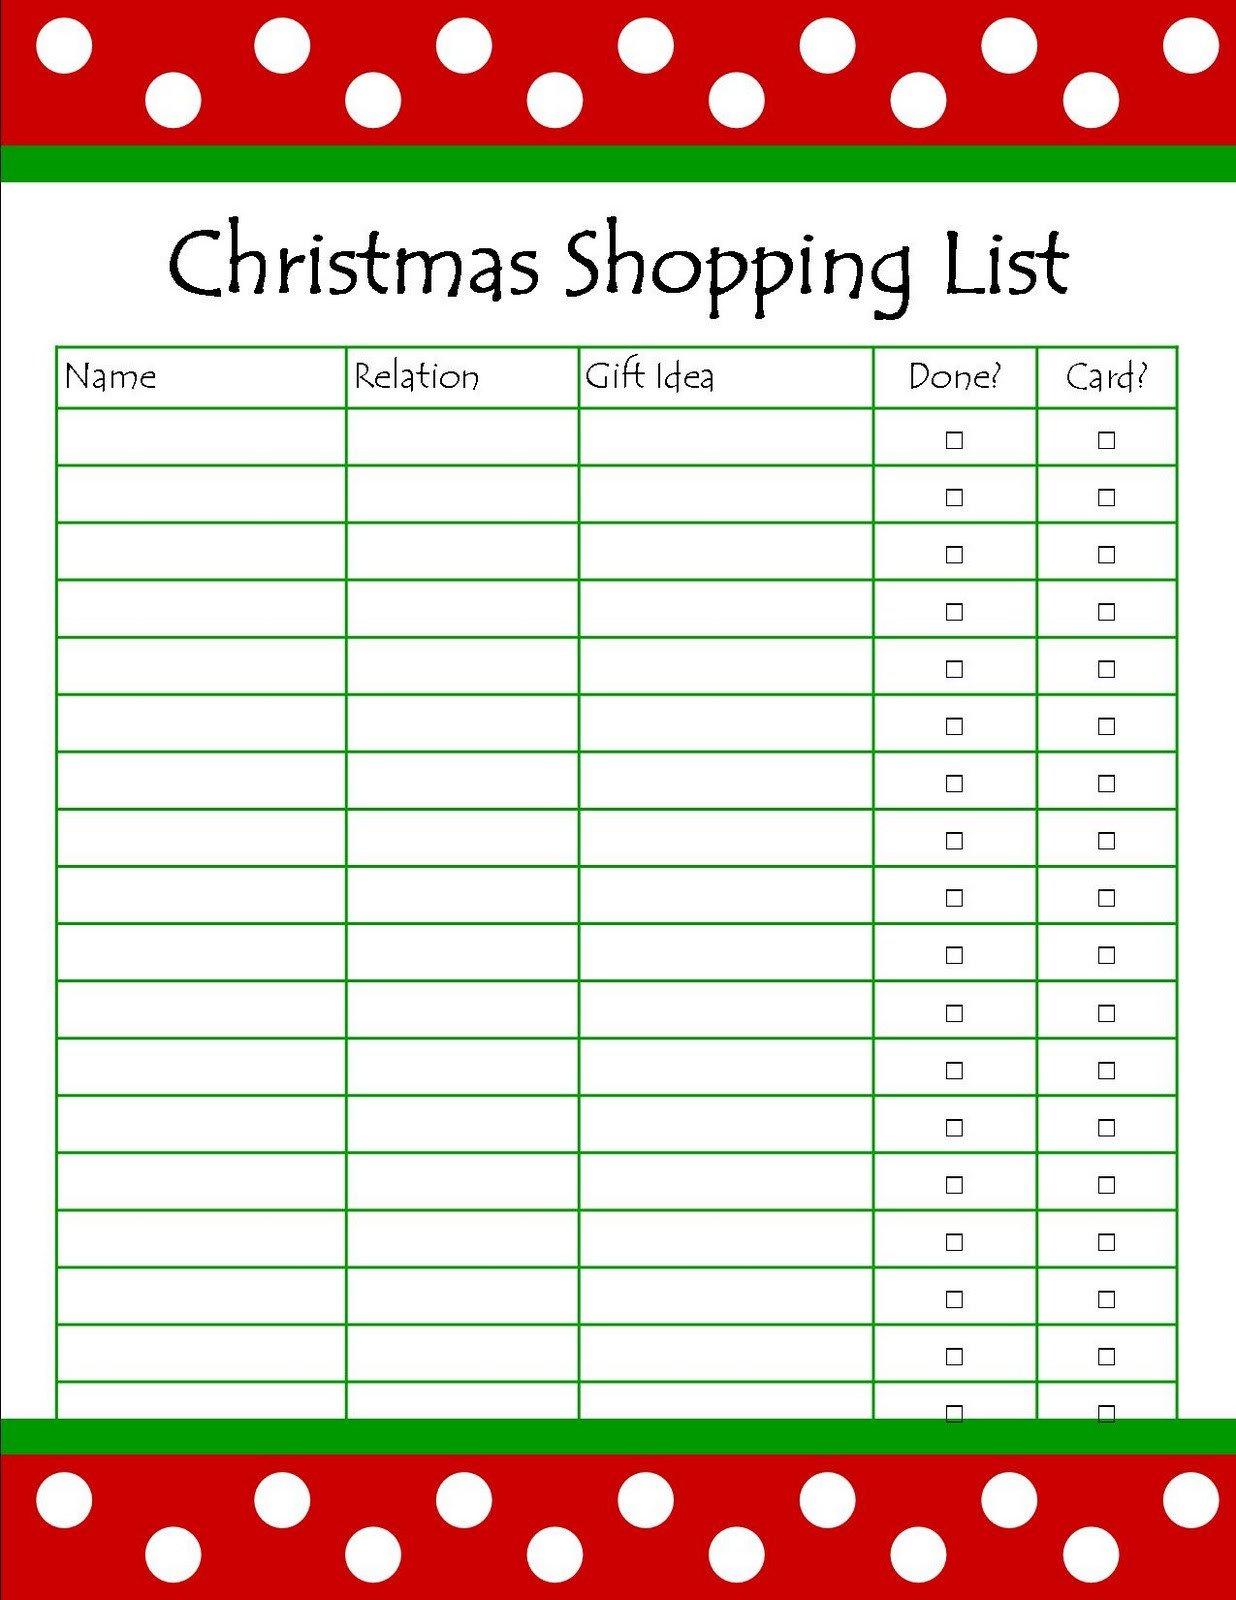 Christmas Gift Lists Templates It S so Splendid Free Printable Christmas Shopping List